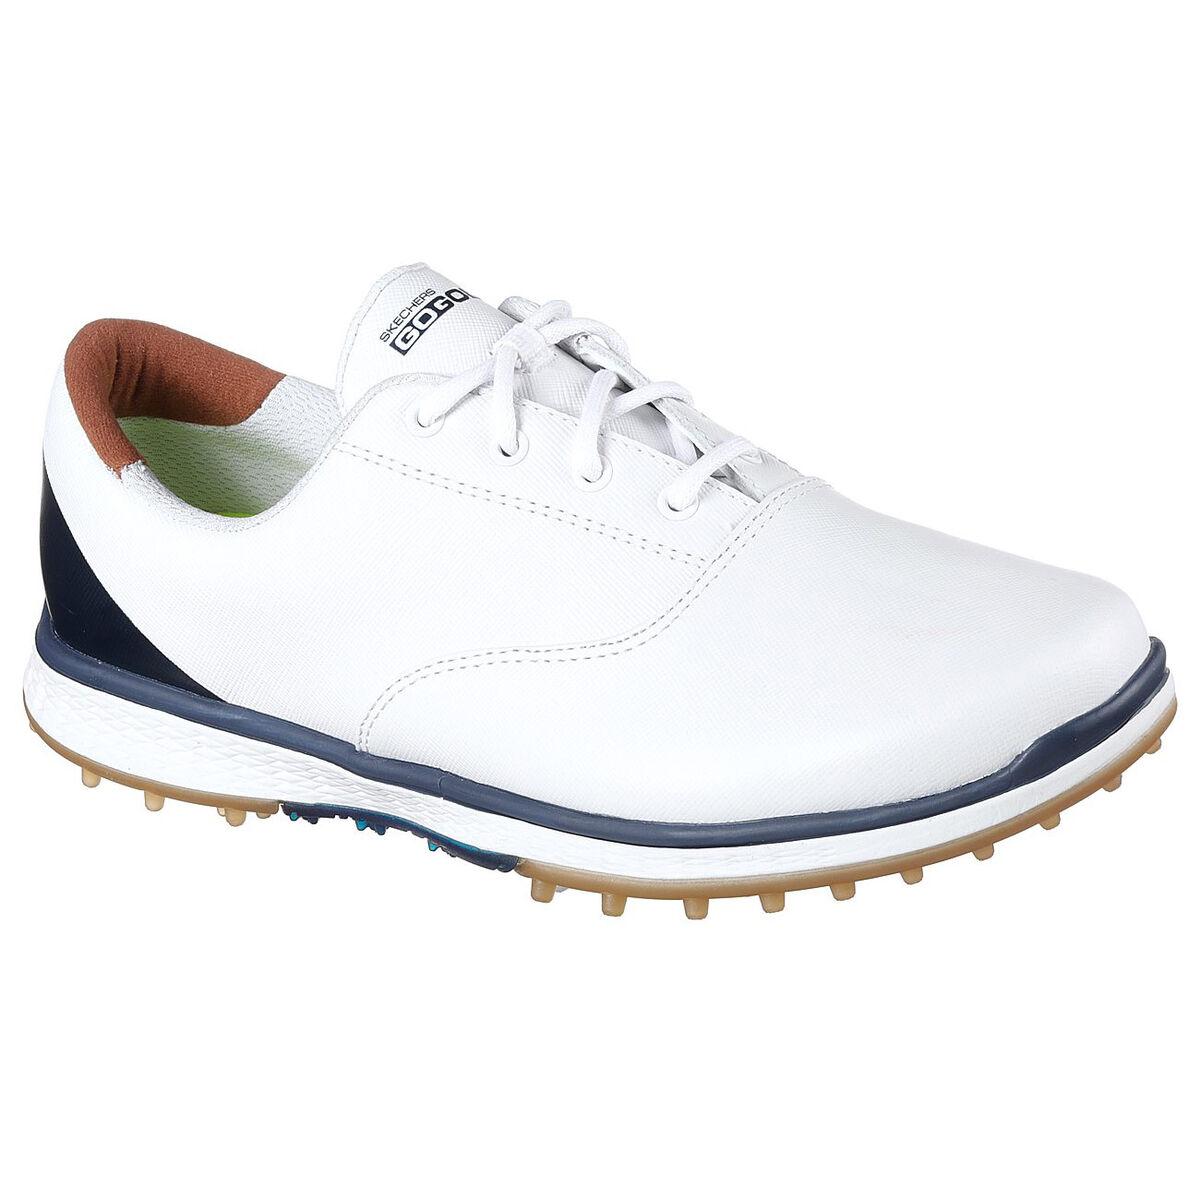 d3df2719c27 Skechers Go Golf Elite 2 Adjust Women s Golf Shoe - White Navy